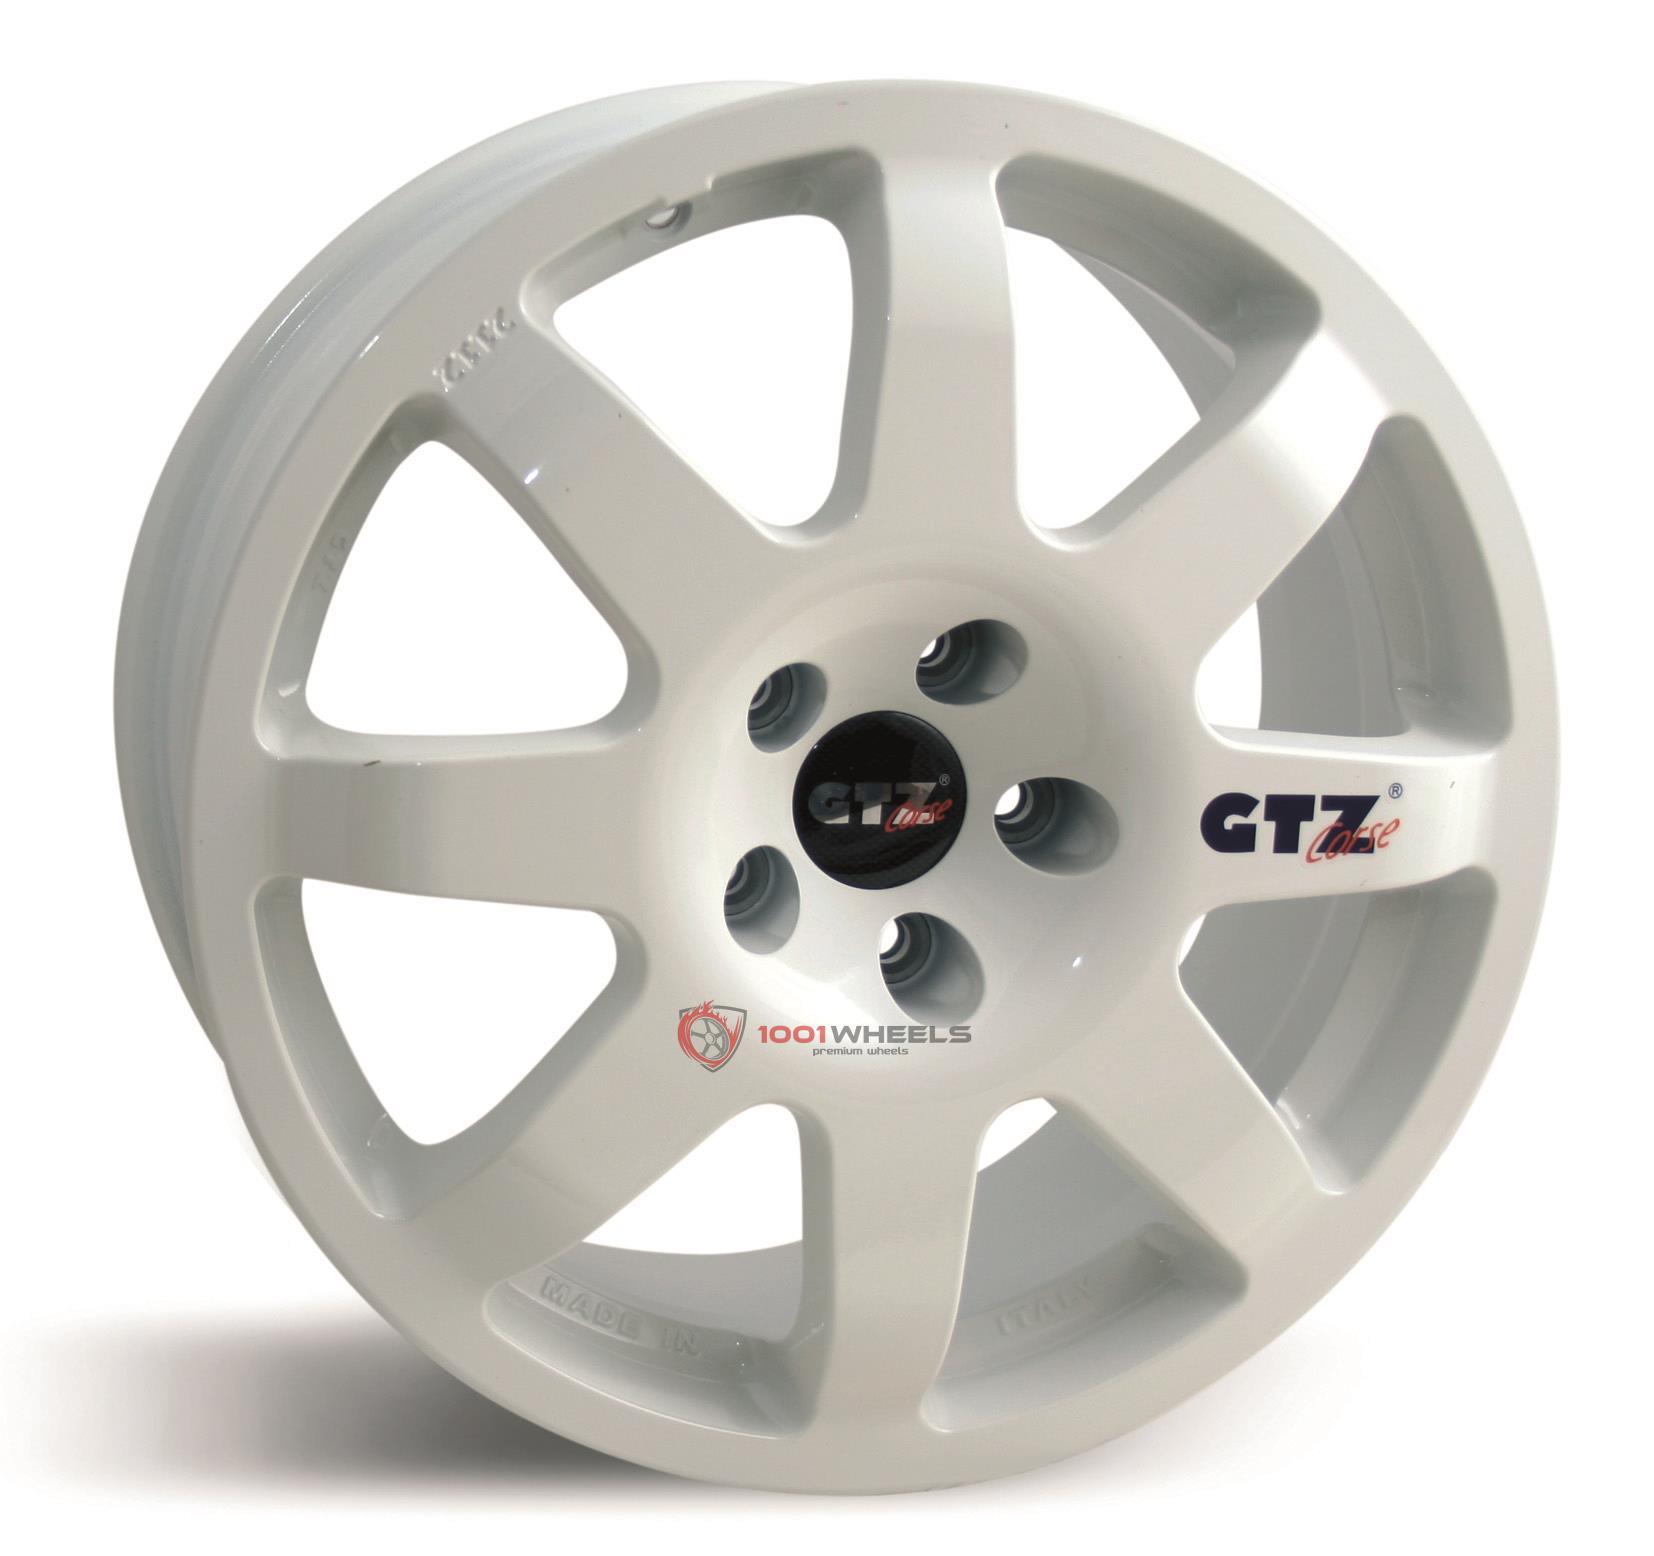 GTZ 2112 GRUPO A blanco